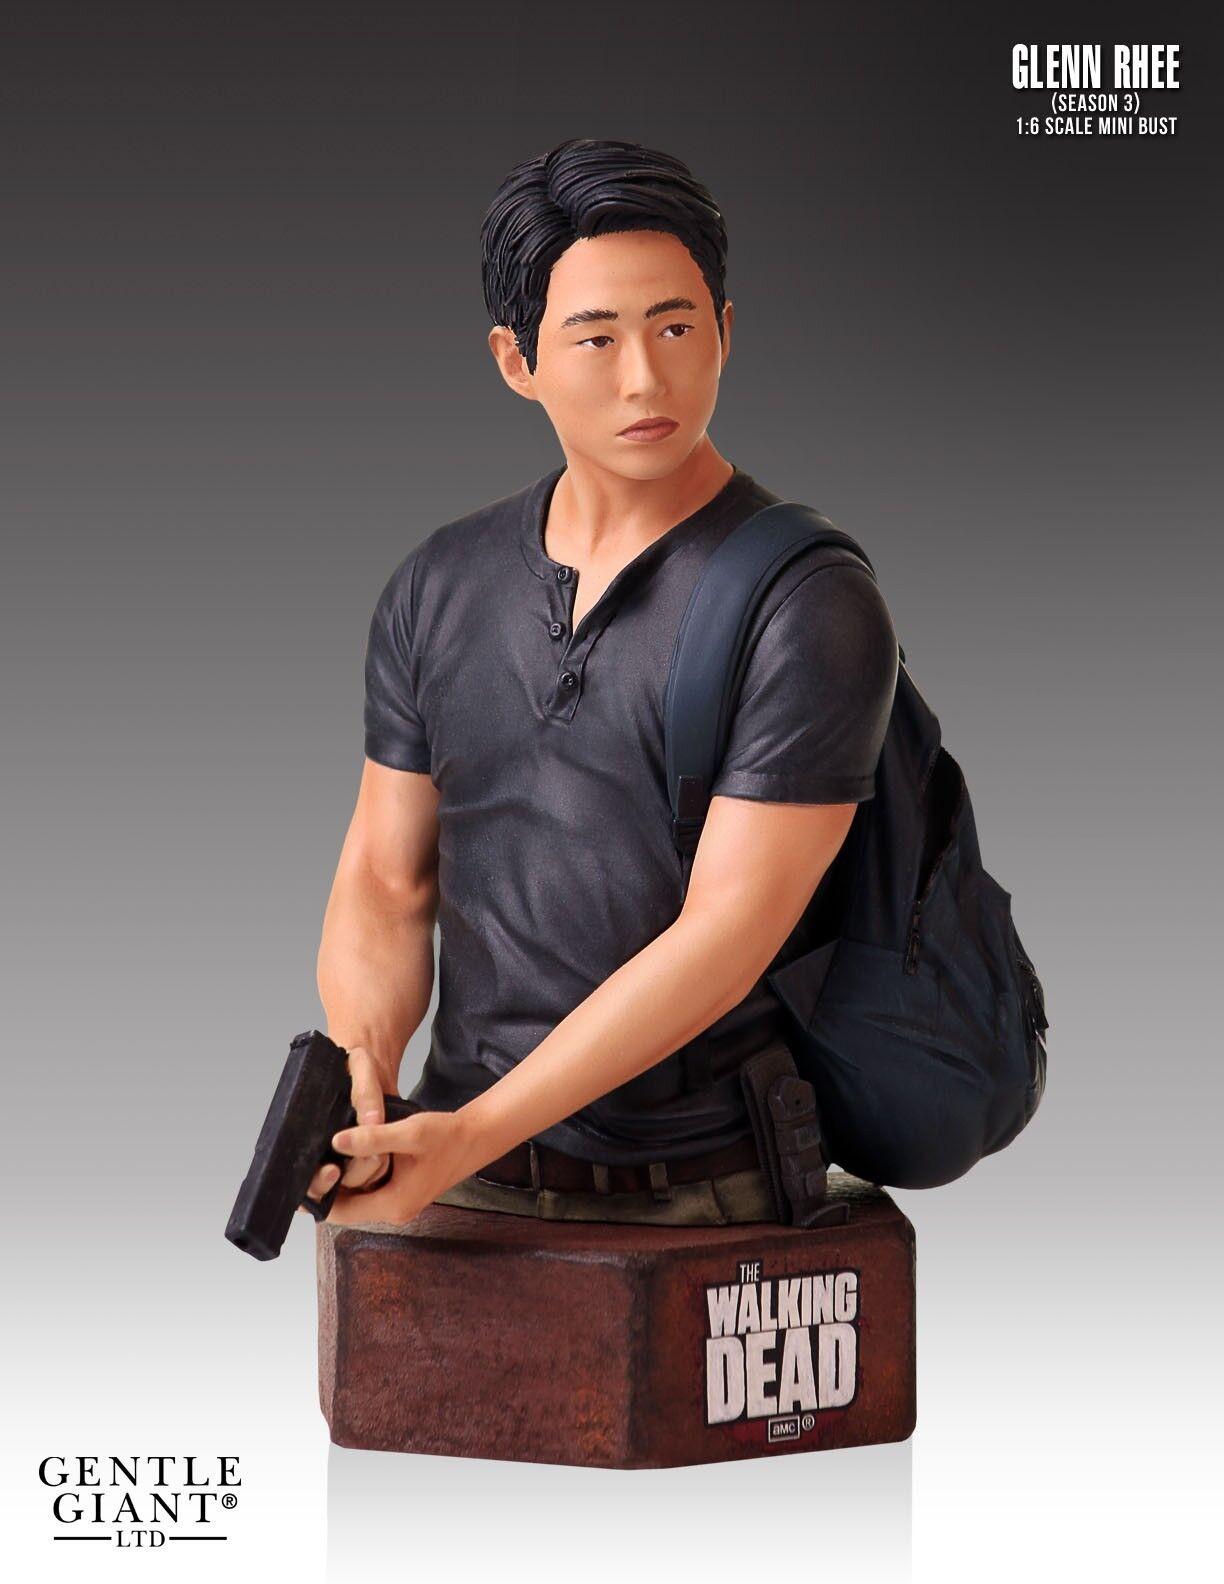 Gentle Giant The Walking Dead Glenn Rhee Bust Statue no Sideshow Threezero Weta